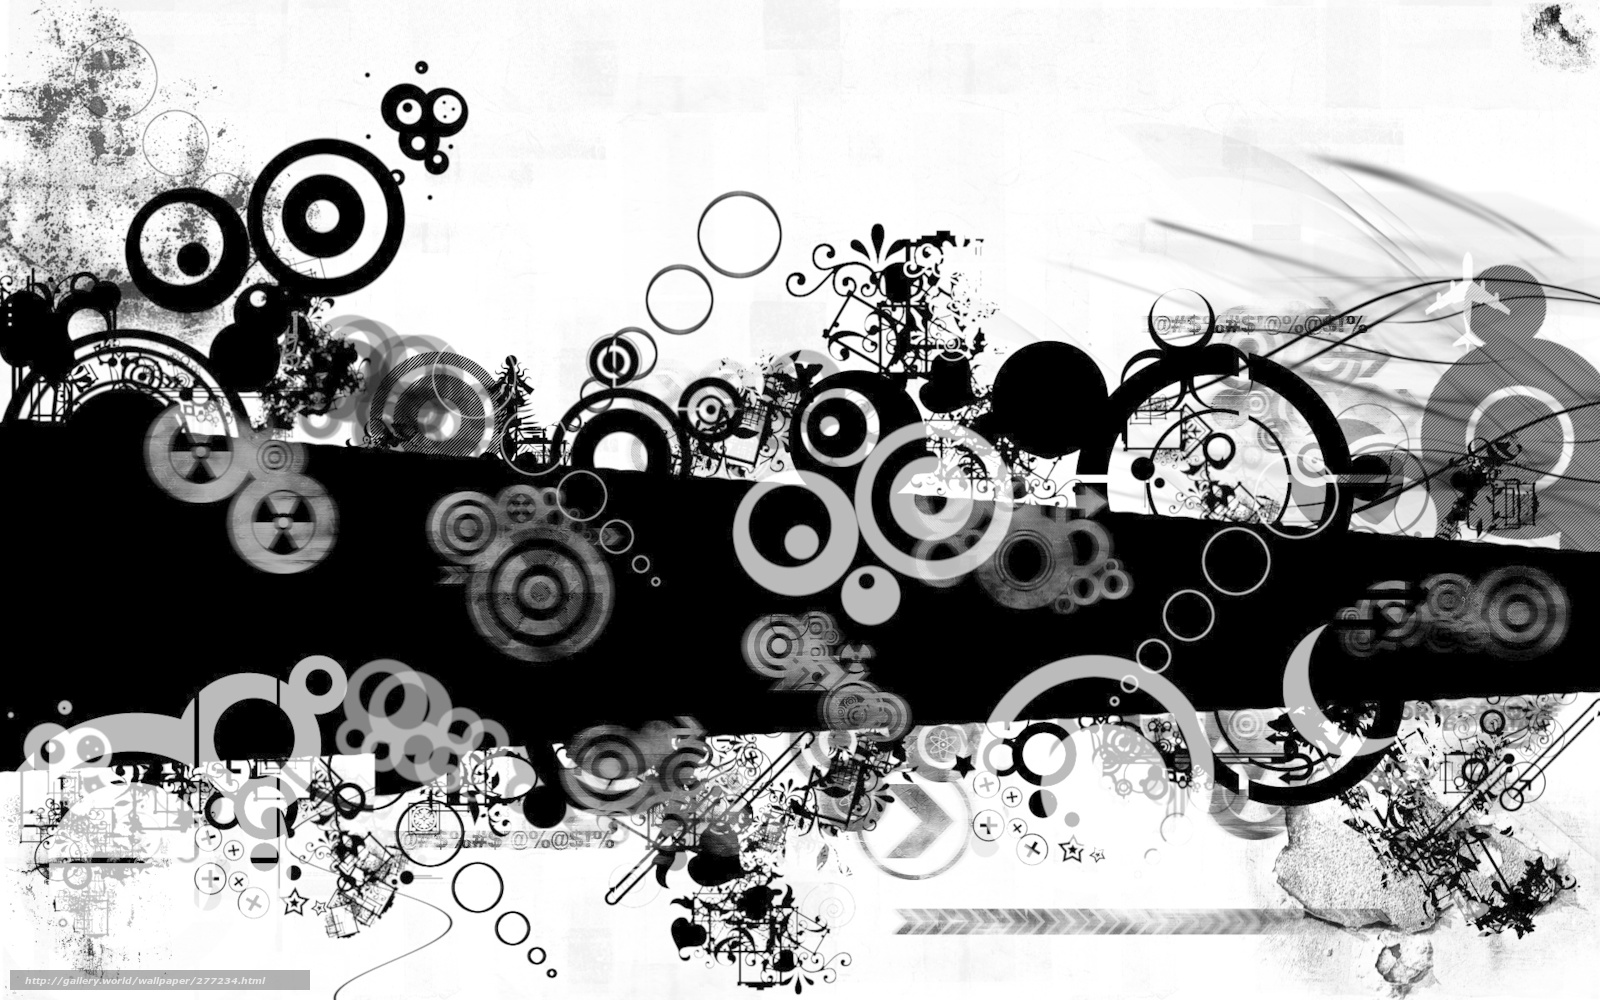 Hq Soyut Siyah Beyaz 1920x1200 Resim Soyutlama Picture